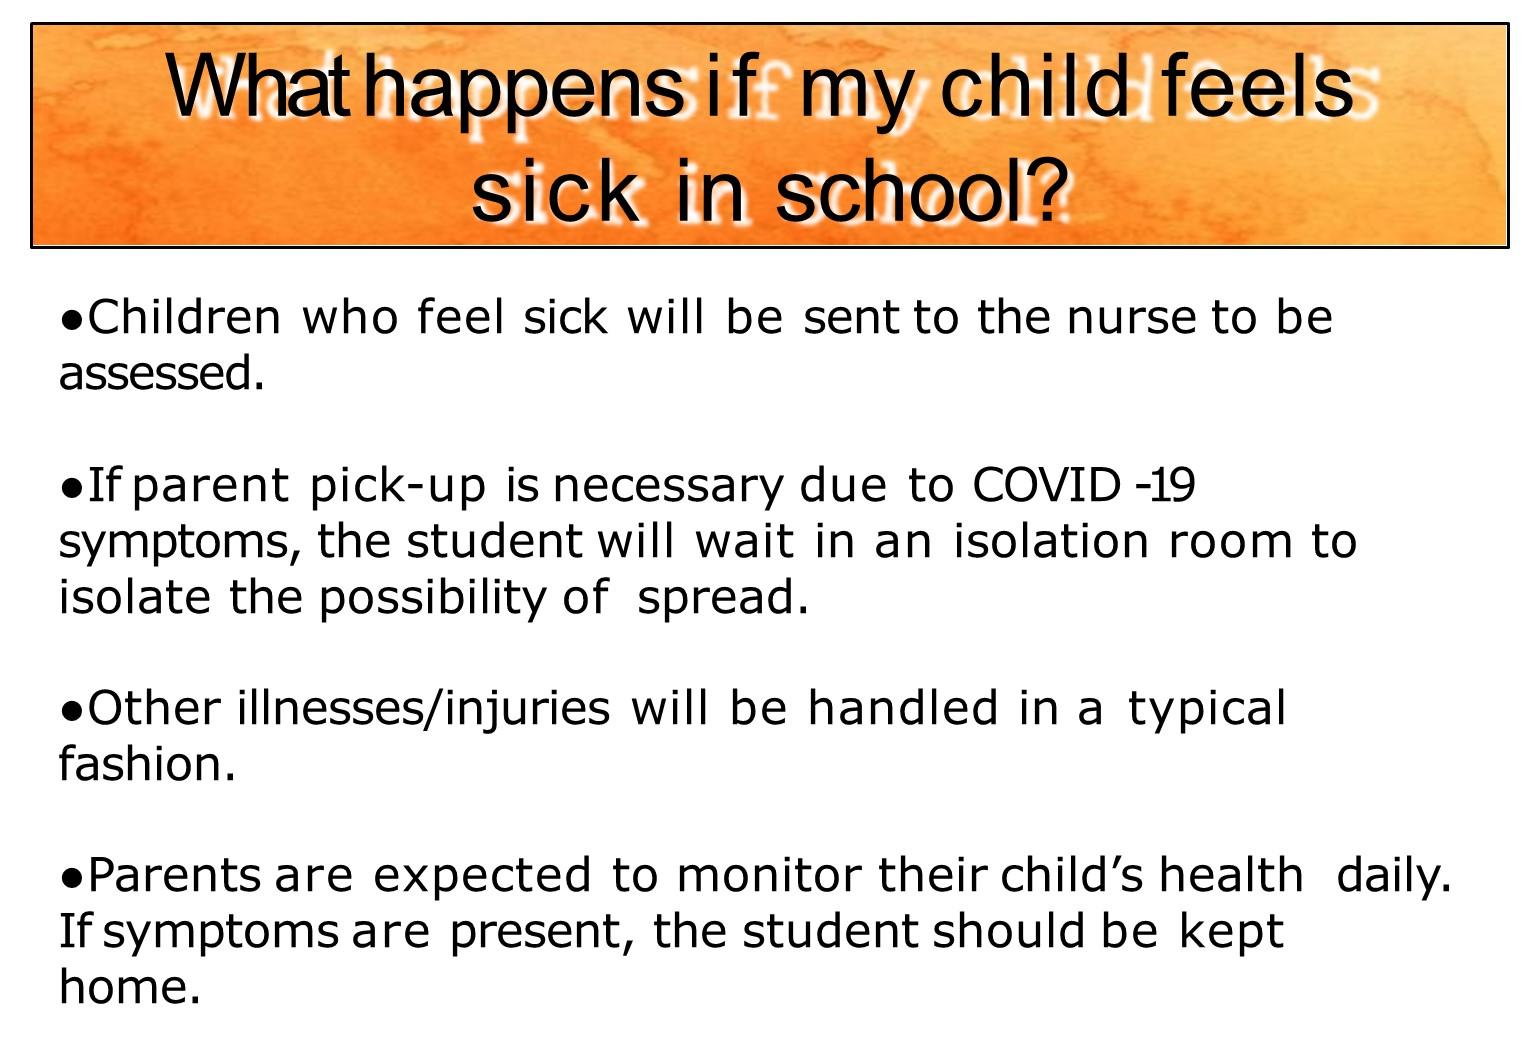 Sick child in school